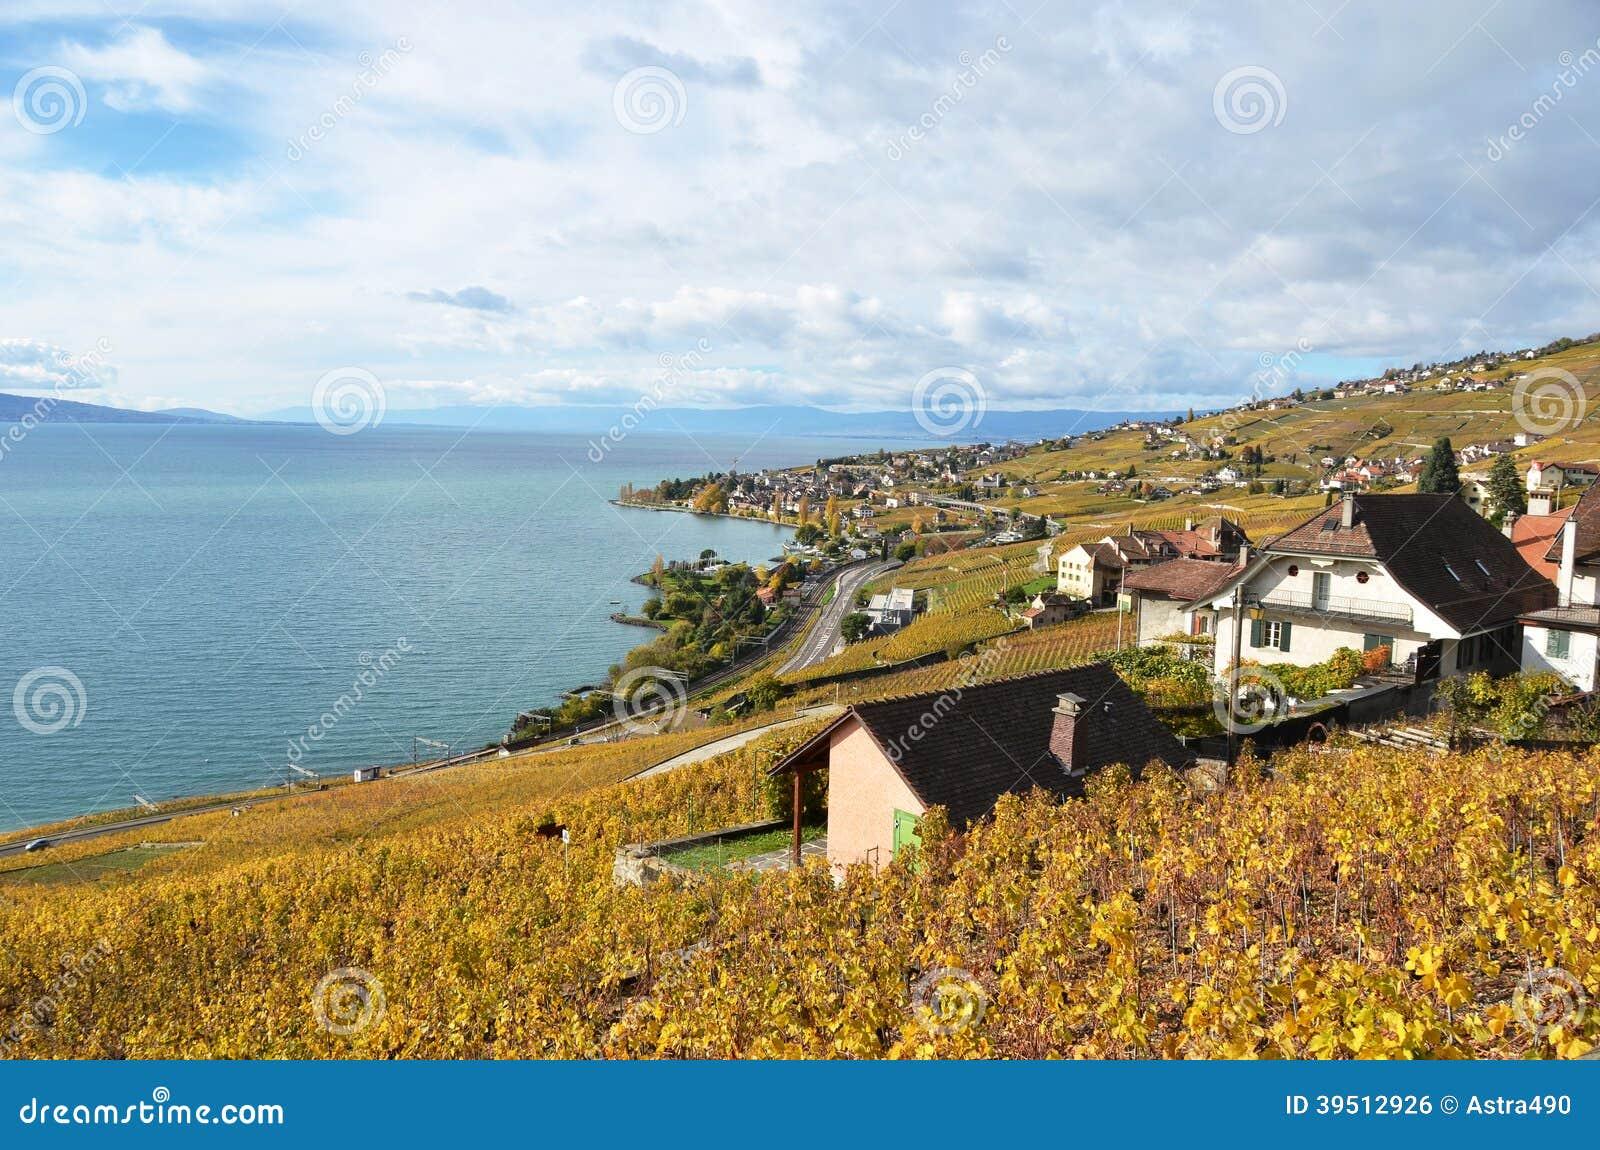 Lavaux region, Switzerland